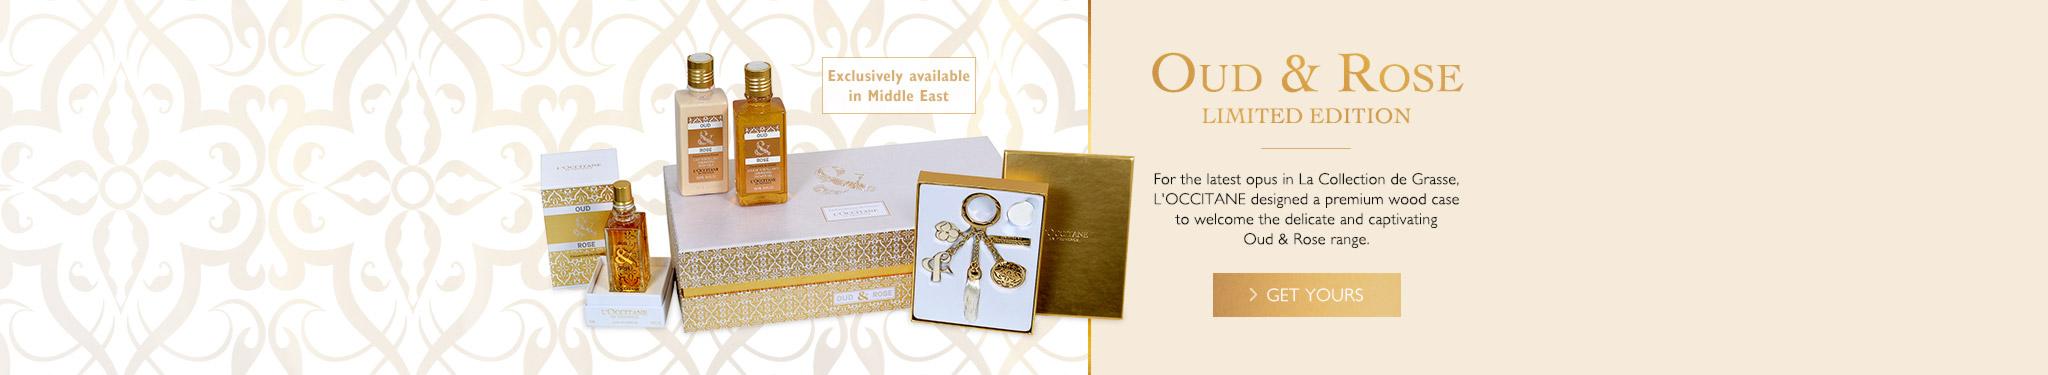 Buy L'Occitane Online Dubai